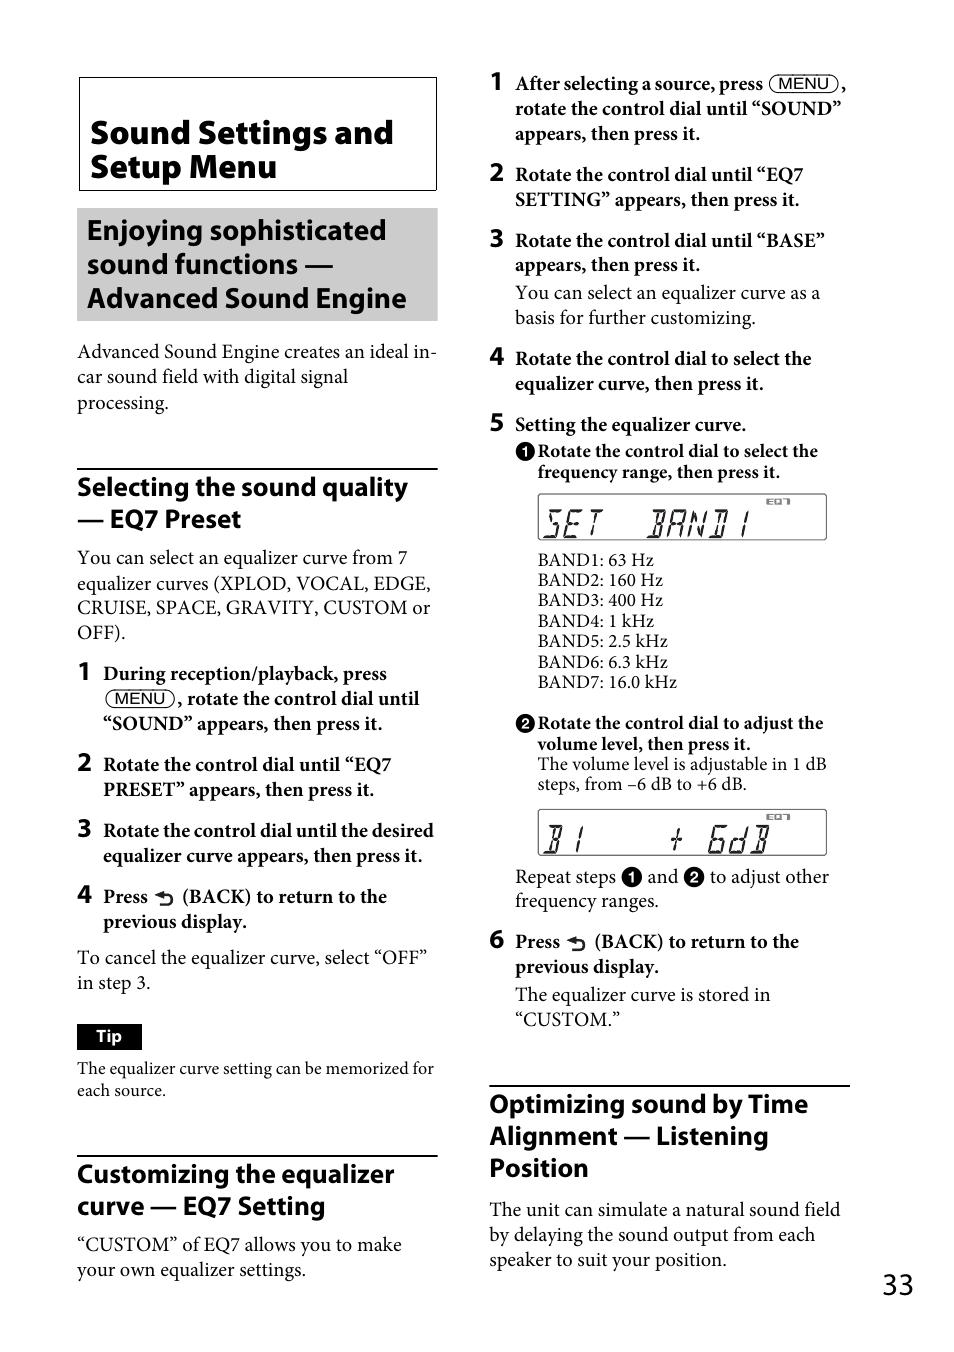 Sound settings and setup menu, Selecting the sound quality — eq7